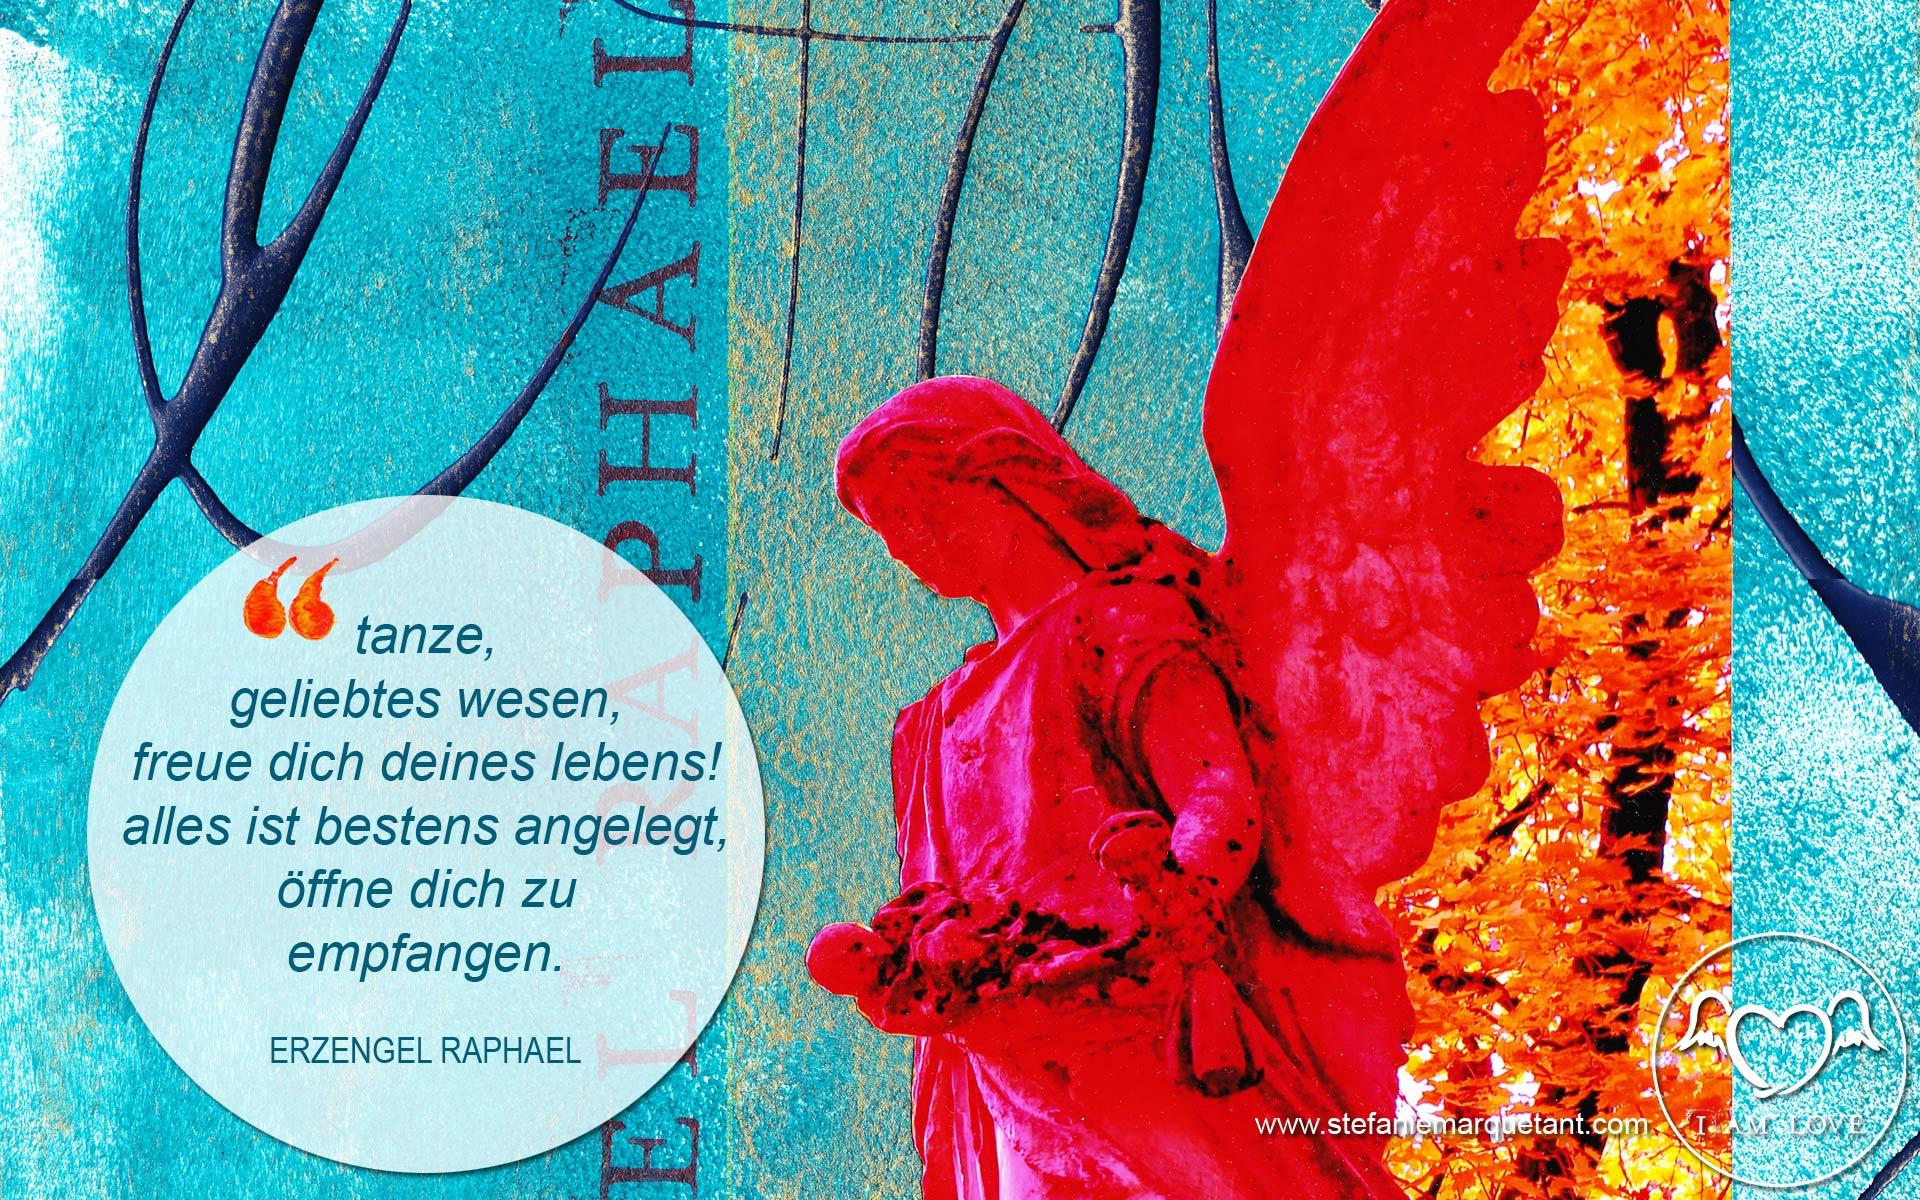 Wallpaper Erzengel Raphael Stefanie Marquetant